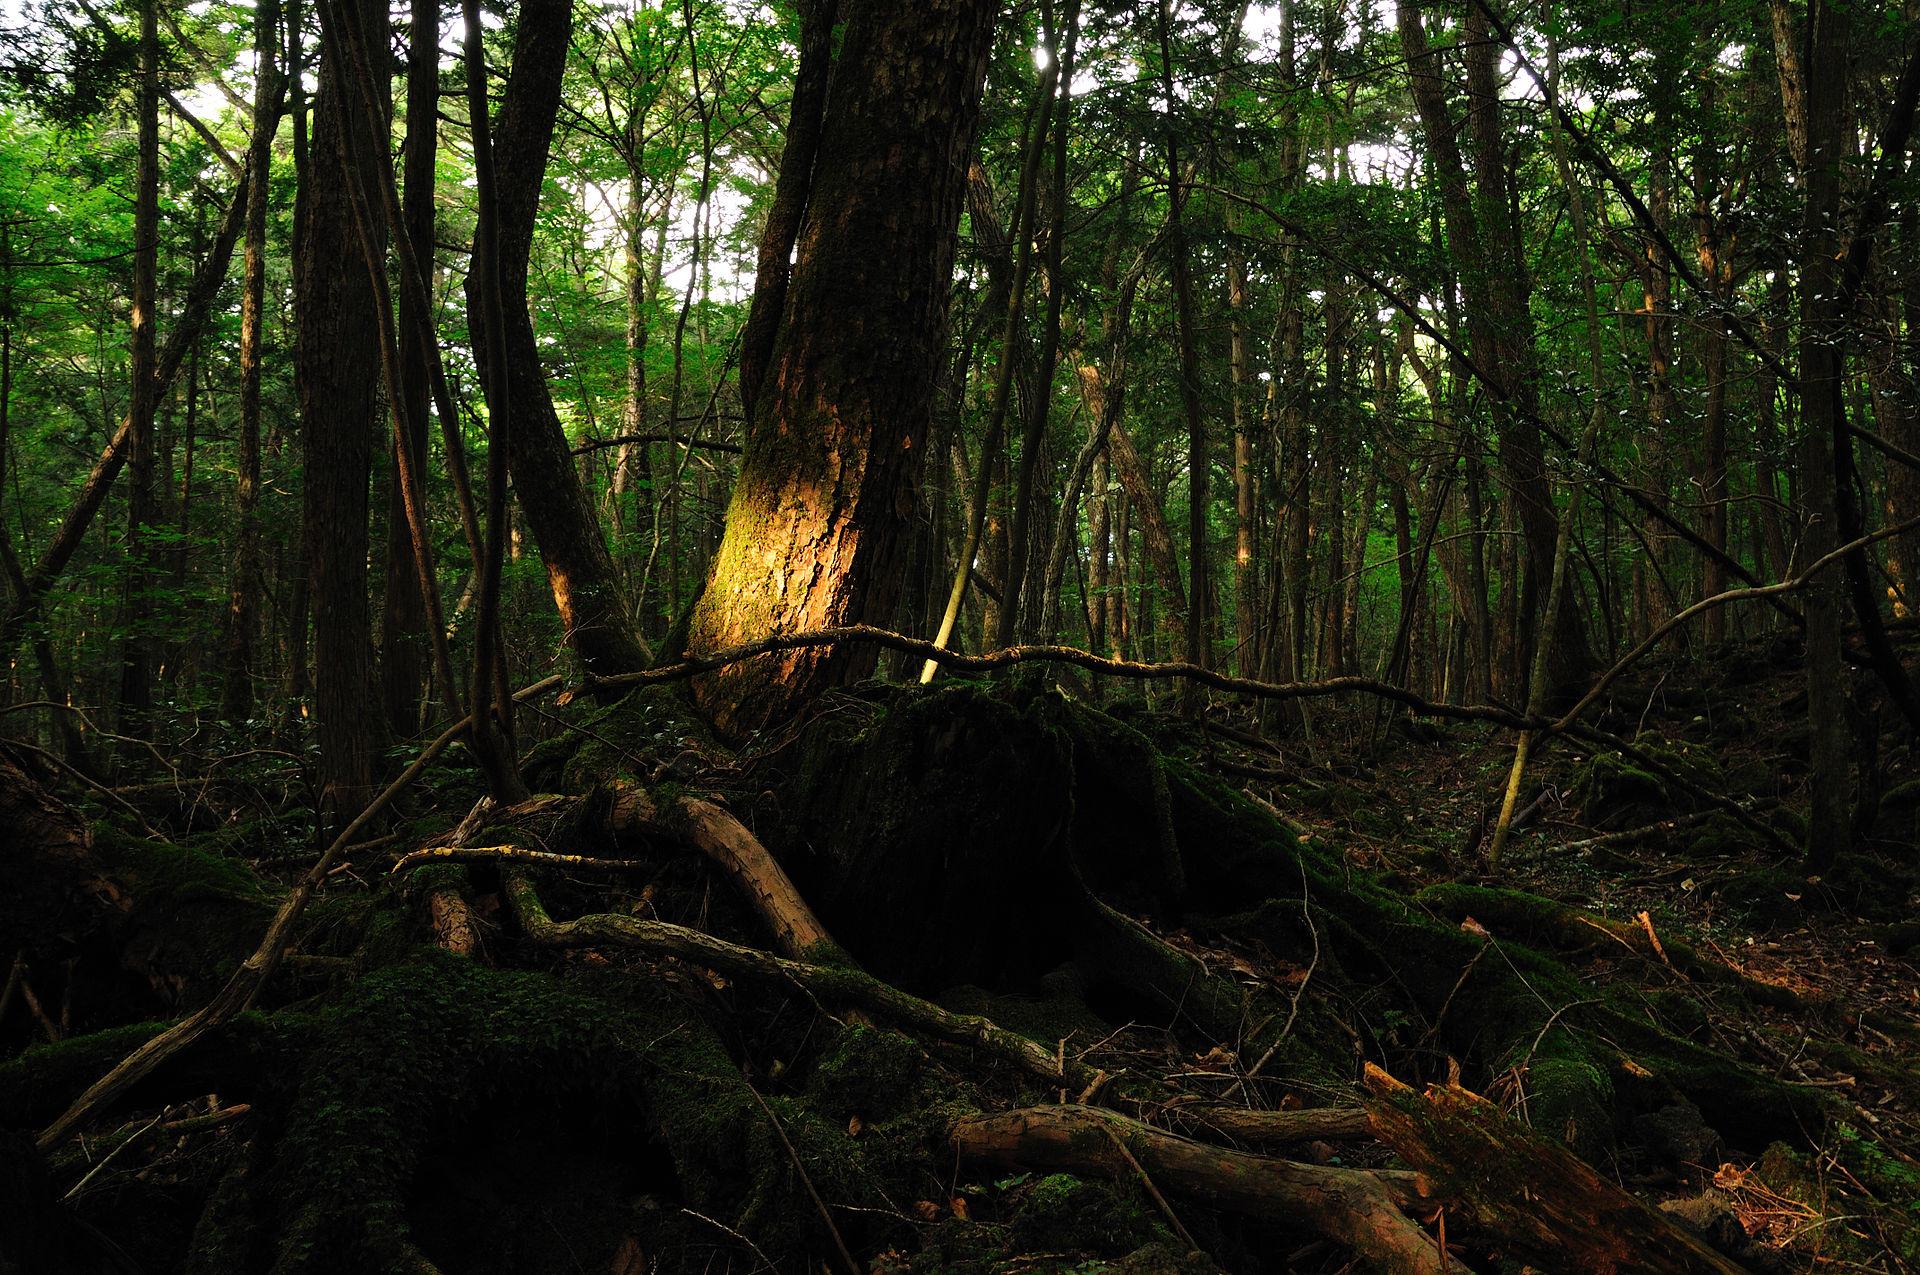 Aokigahara_forest_01.jpg